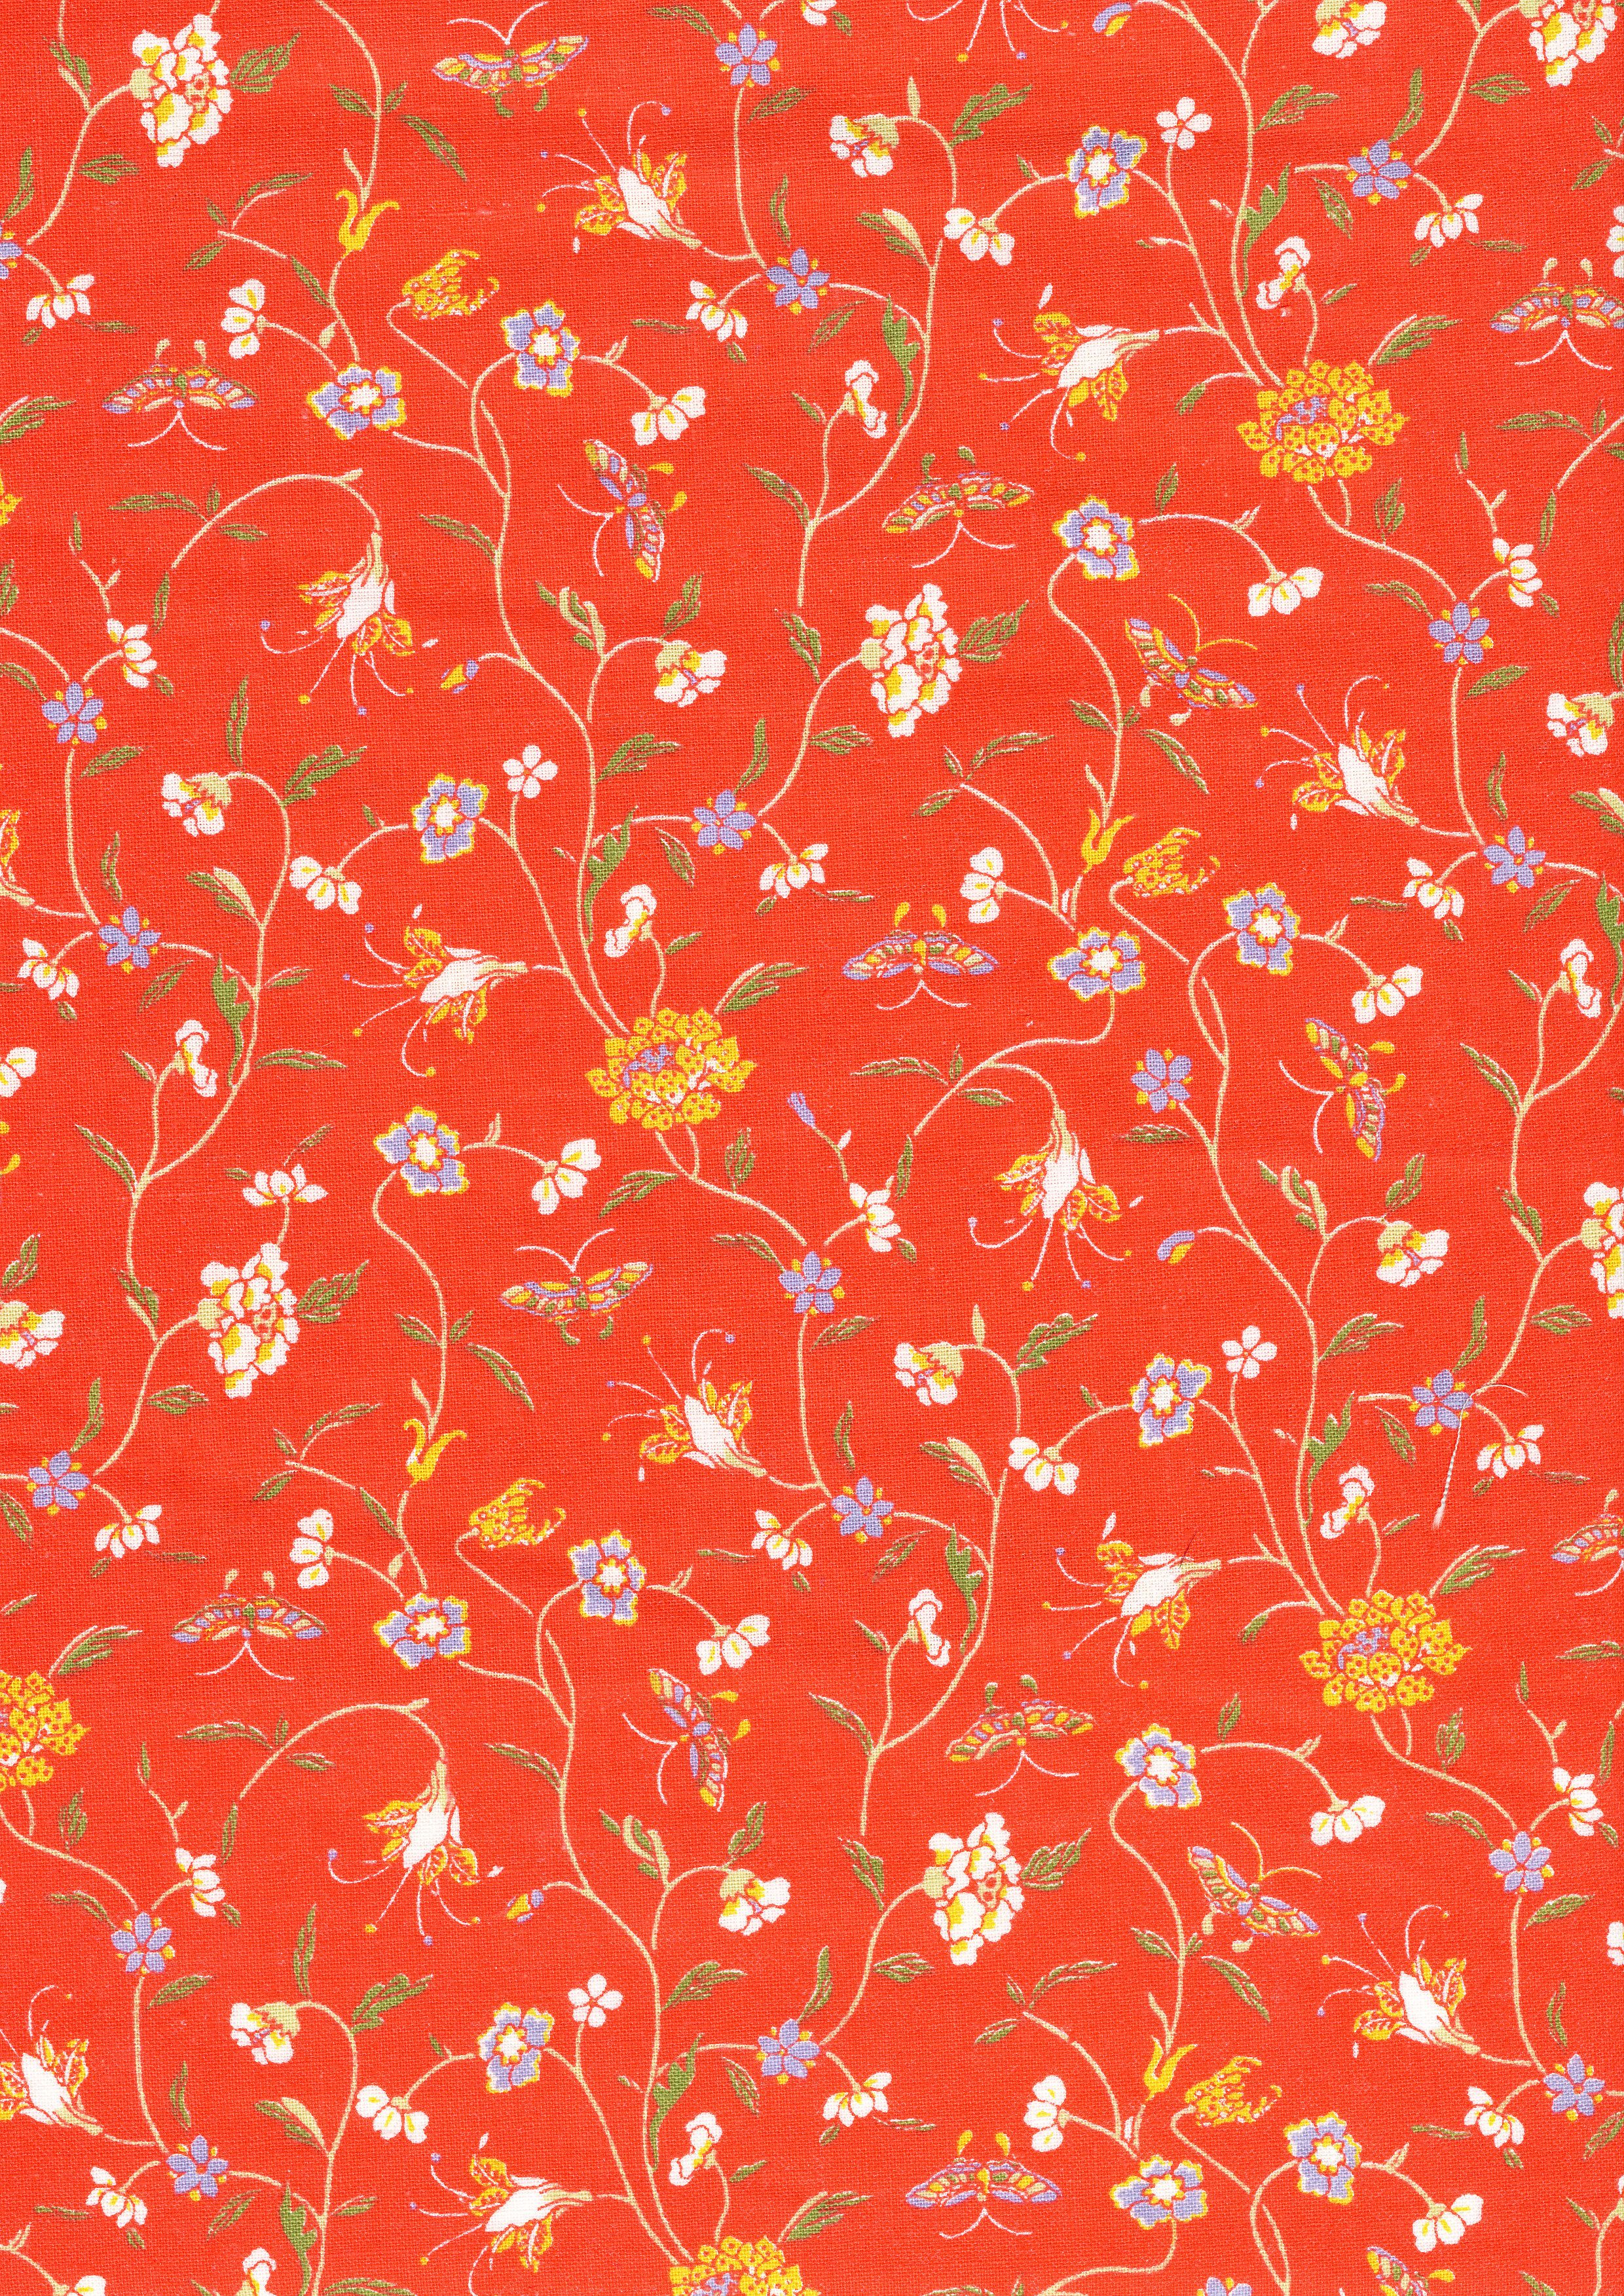 Floral Fancy Laura Ashley Floribunda Fabric Lauraashley60 Had